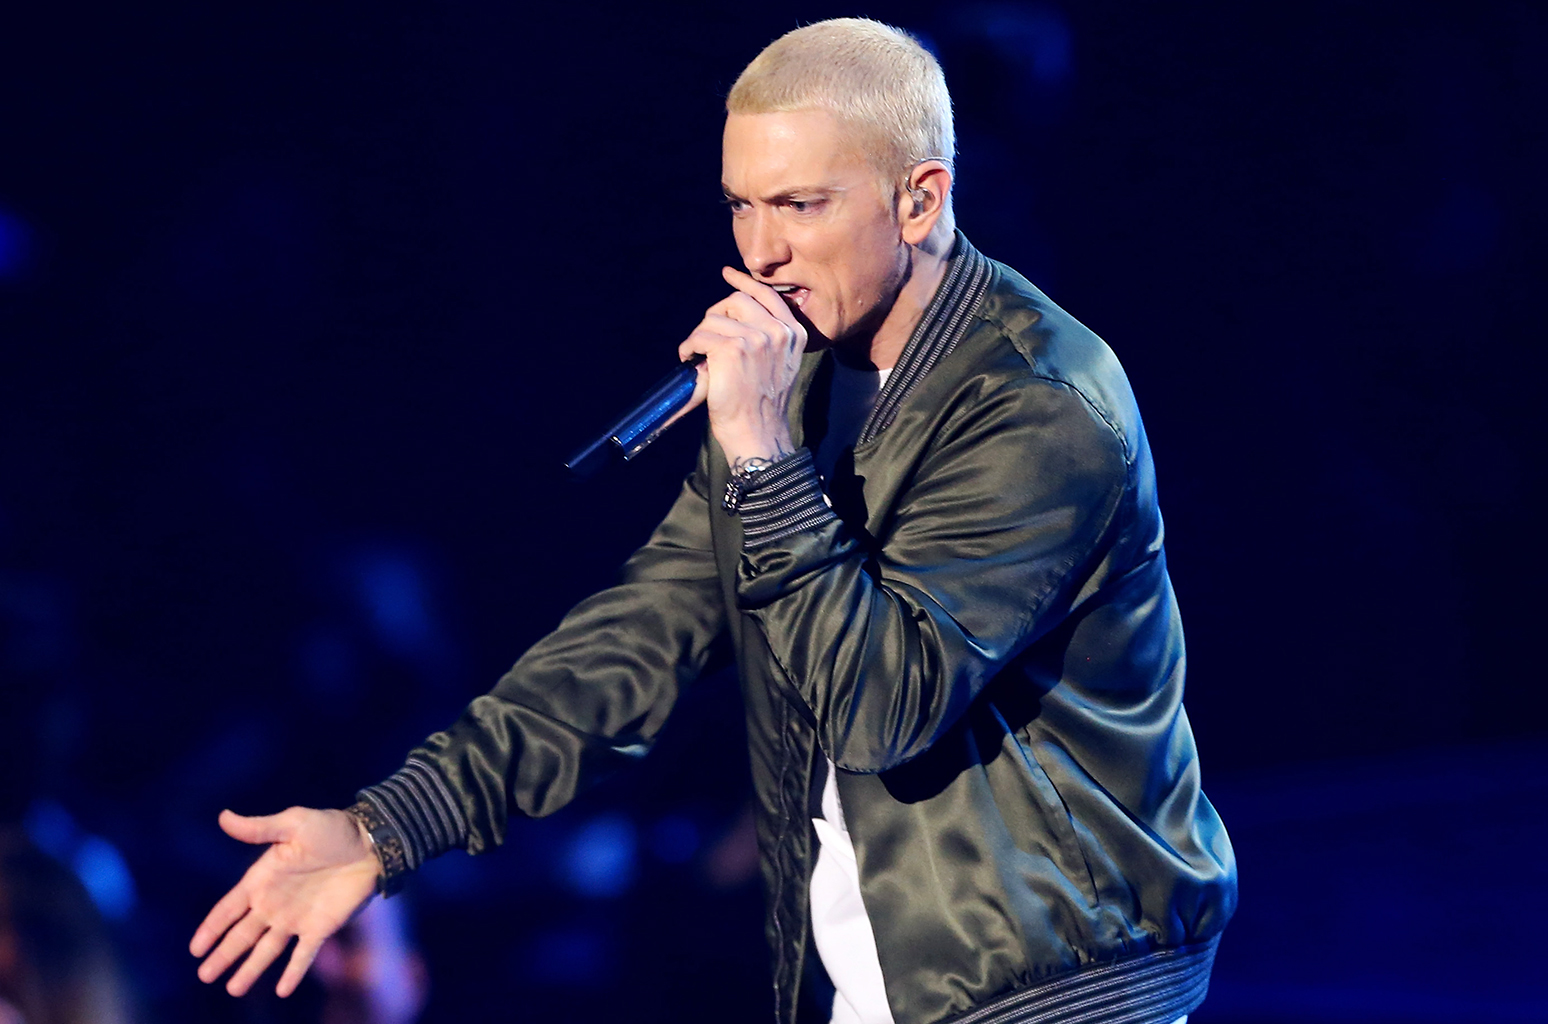 Catch Eminem TONIGHT On The BET Hip Hop Awards!